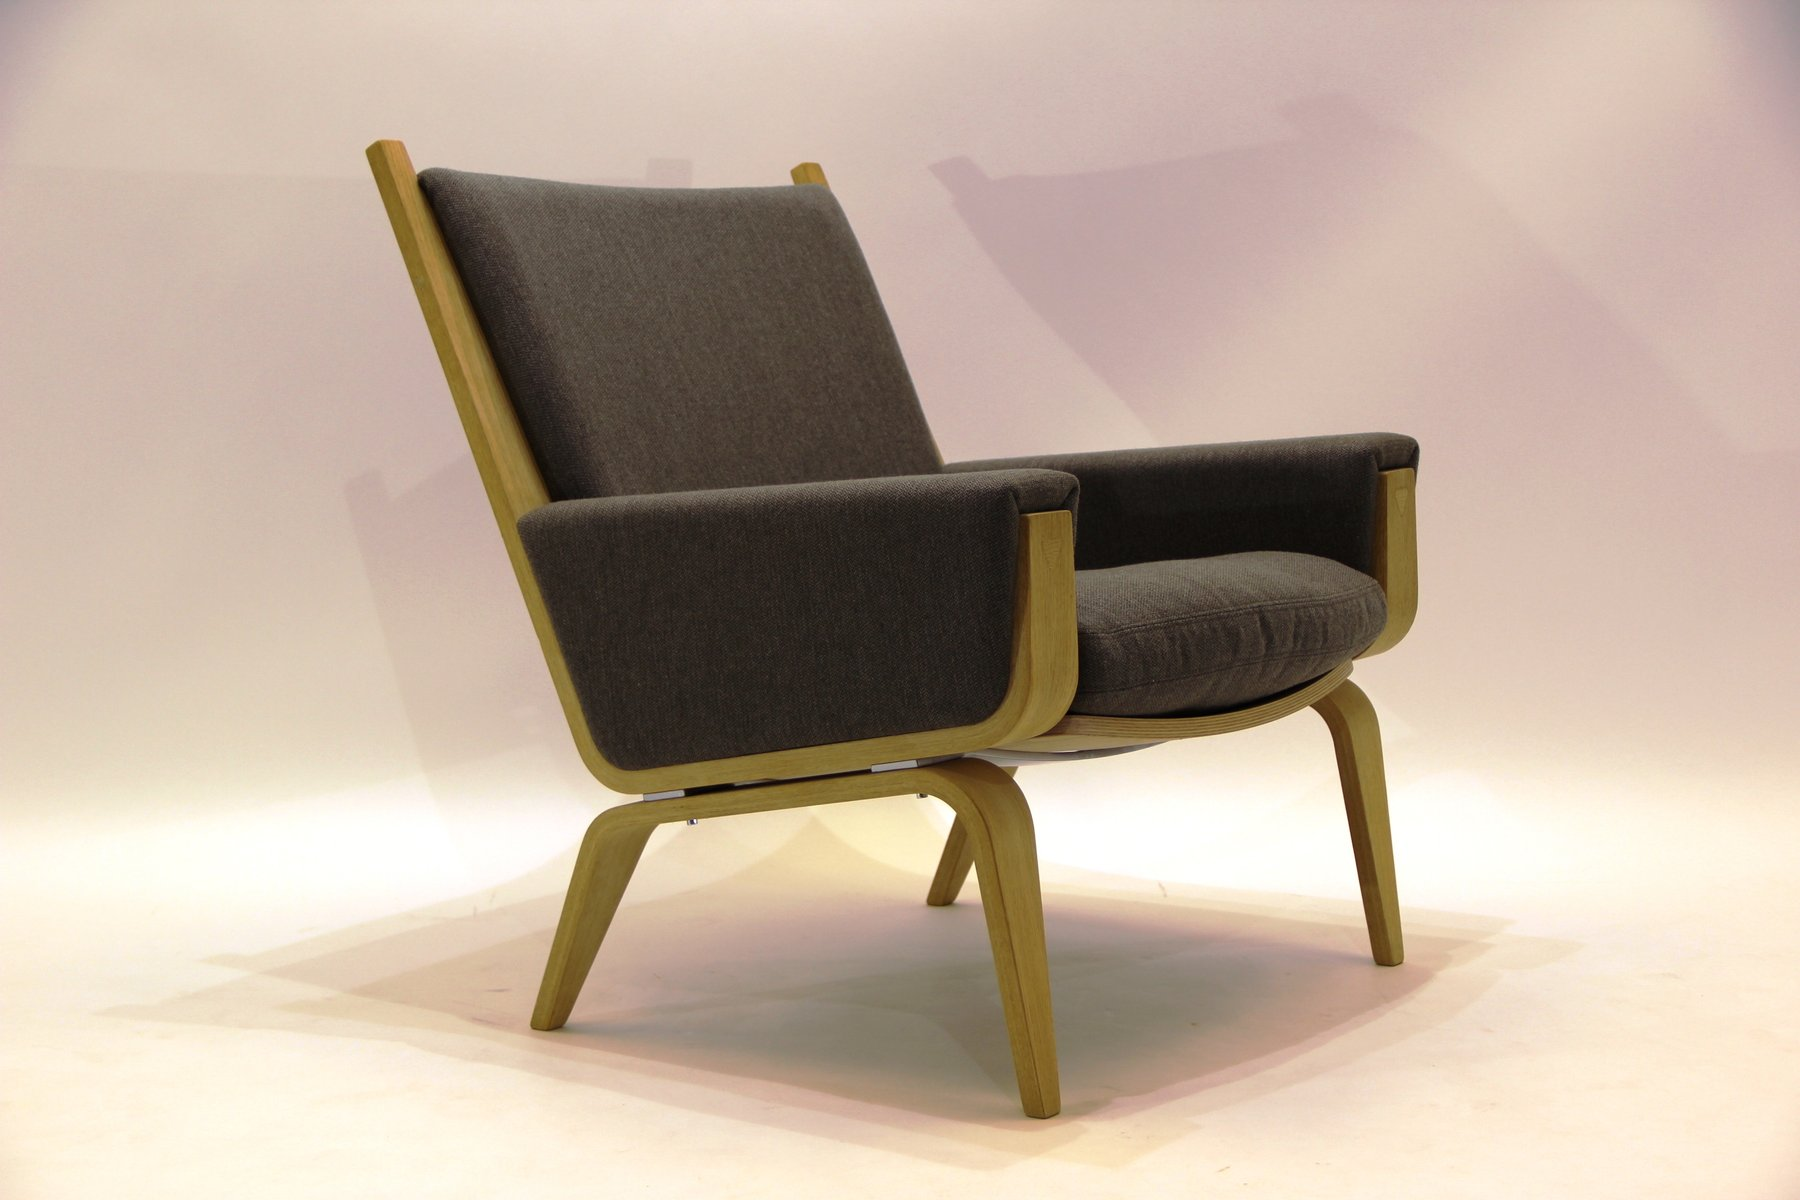 ge 501a sessel von hans j wegner f r getama 1967 bei pamono kaufen. Black Bedroom Furniture Sets. Home Design Ideas